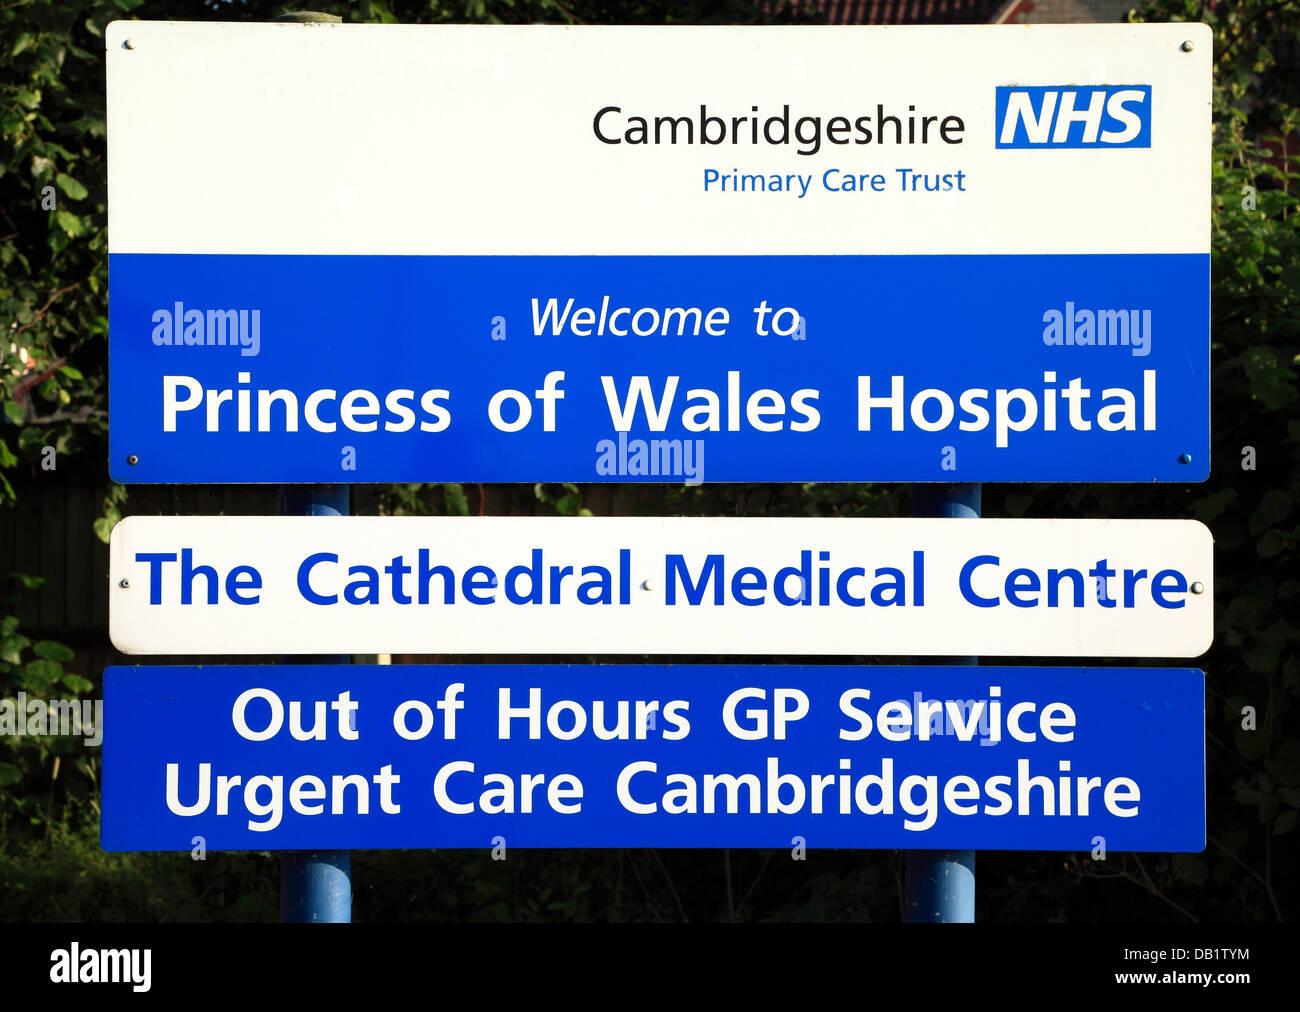 Ely, Princess of Wales Hospital, Zeichen, Cambridgeshire NHS, Primary Care Trust, Kathedrale Medical Centre England Stockbild